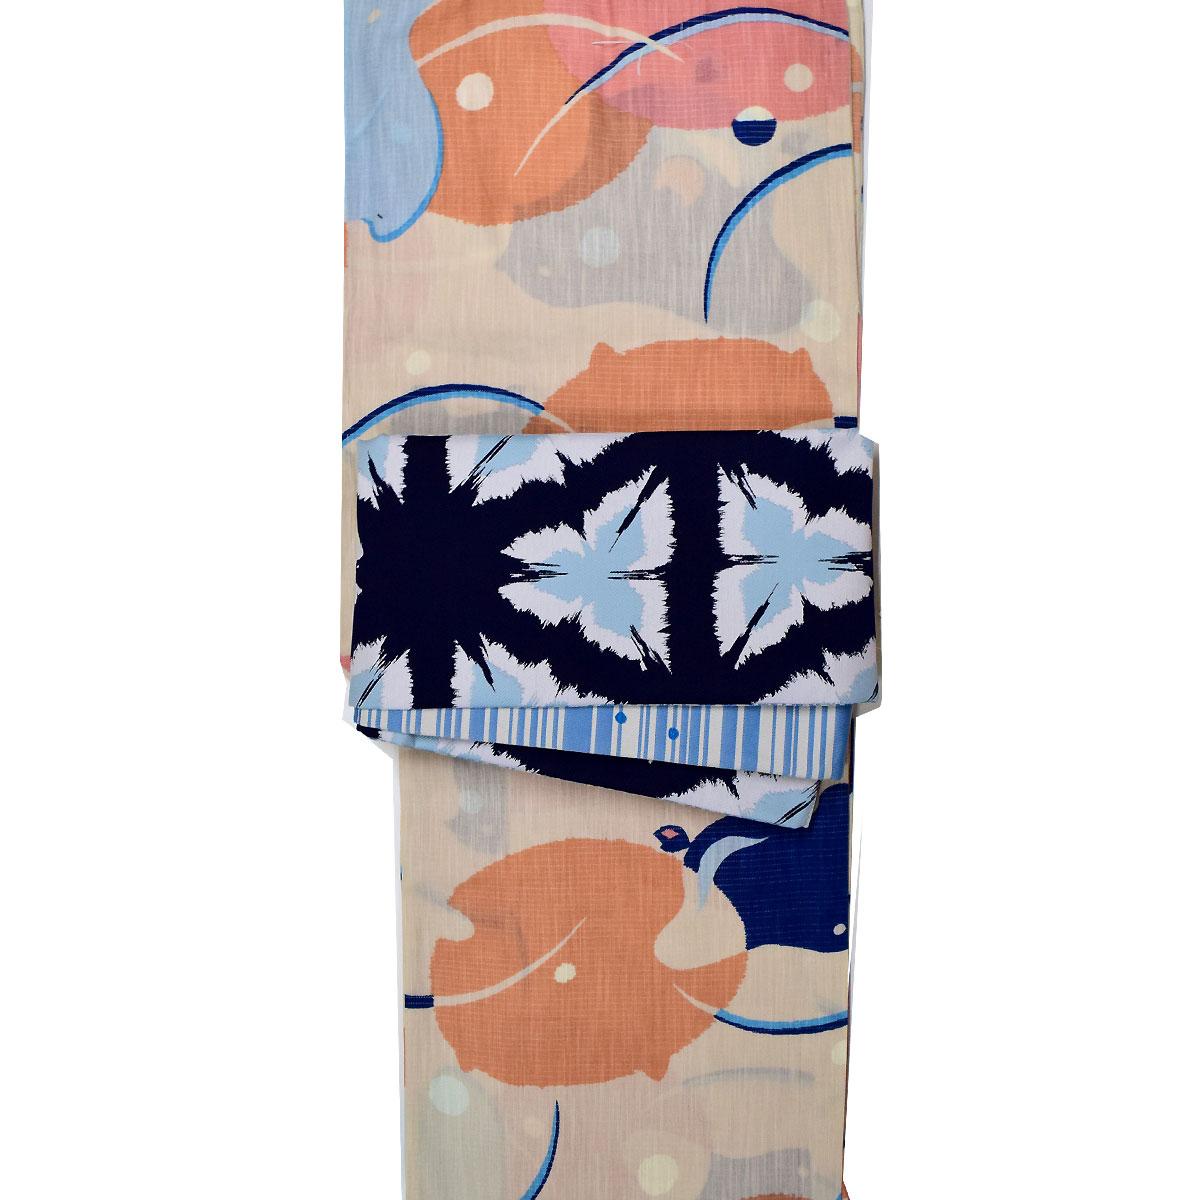 《 tsumori chisato 》 浴衣2点セット (浴衣+帯【彩陽織】 ) 浴衣セット レディース 花火大会 夏祭り 女性用 女性浴衣 ゆかた番号d525-228